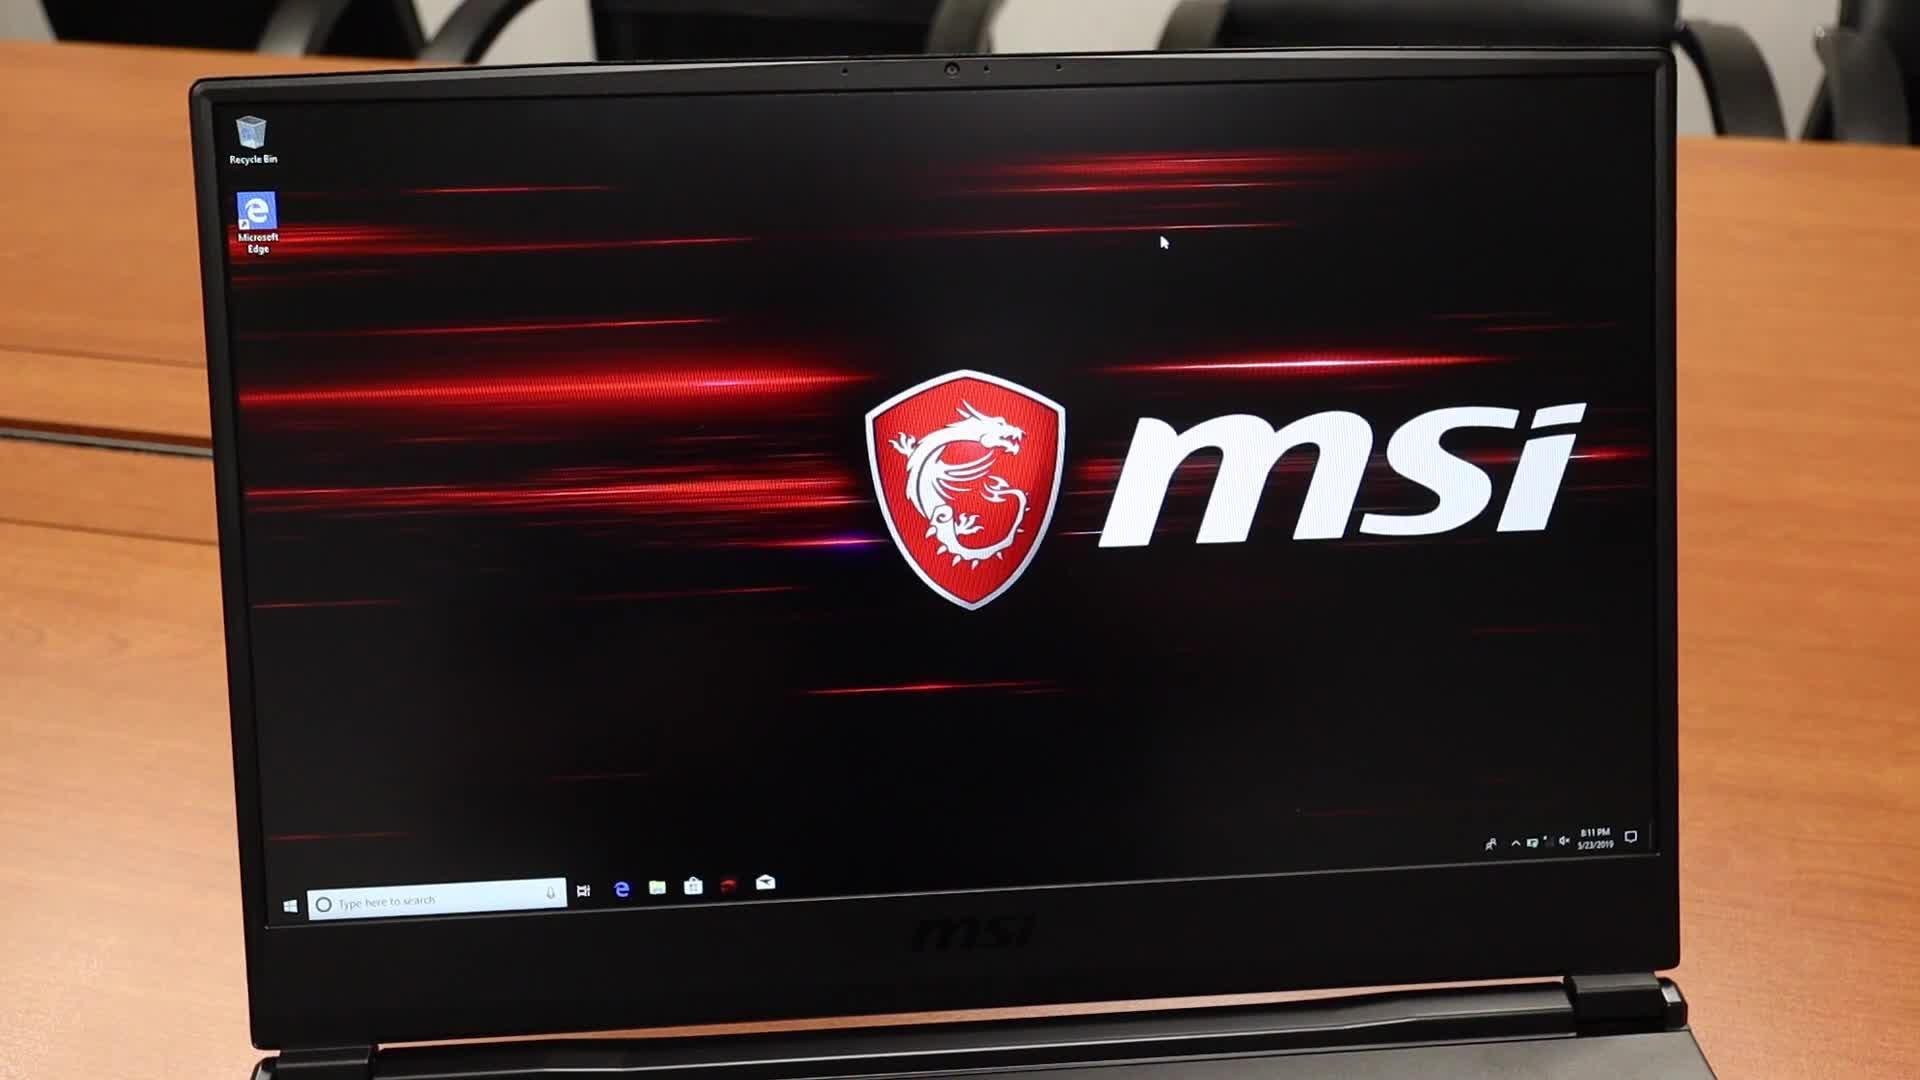 Notebook, Laptop, Hands-On, Computex, NewGadgets, Johannes Knapp, Msi, Gaming-Notebook, Computex 2019, MSI GE65 Raider, MSI GE65, GE65 Raider, GE65